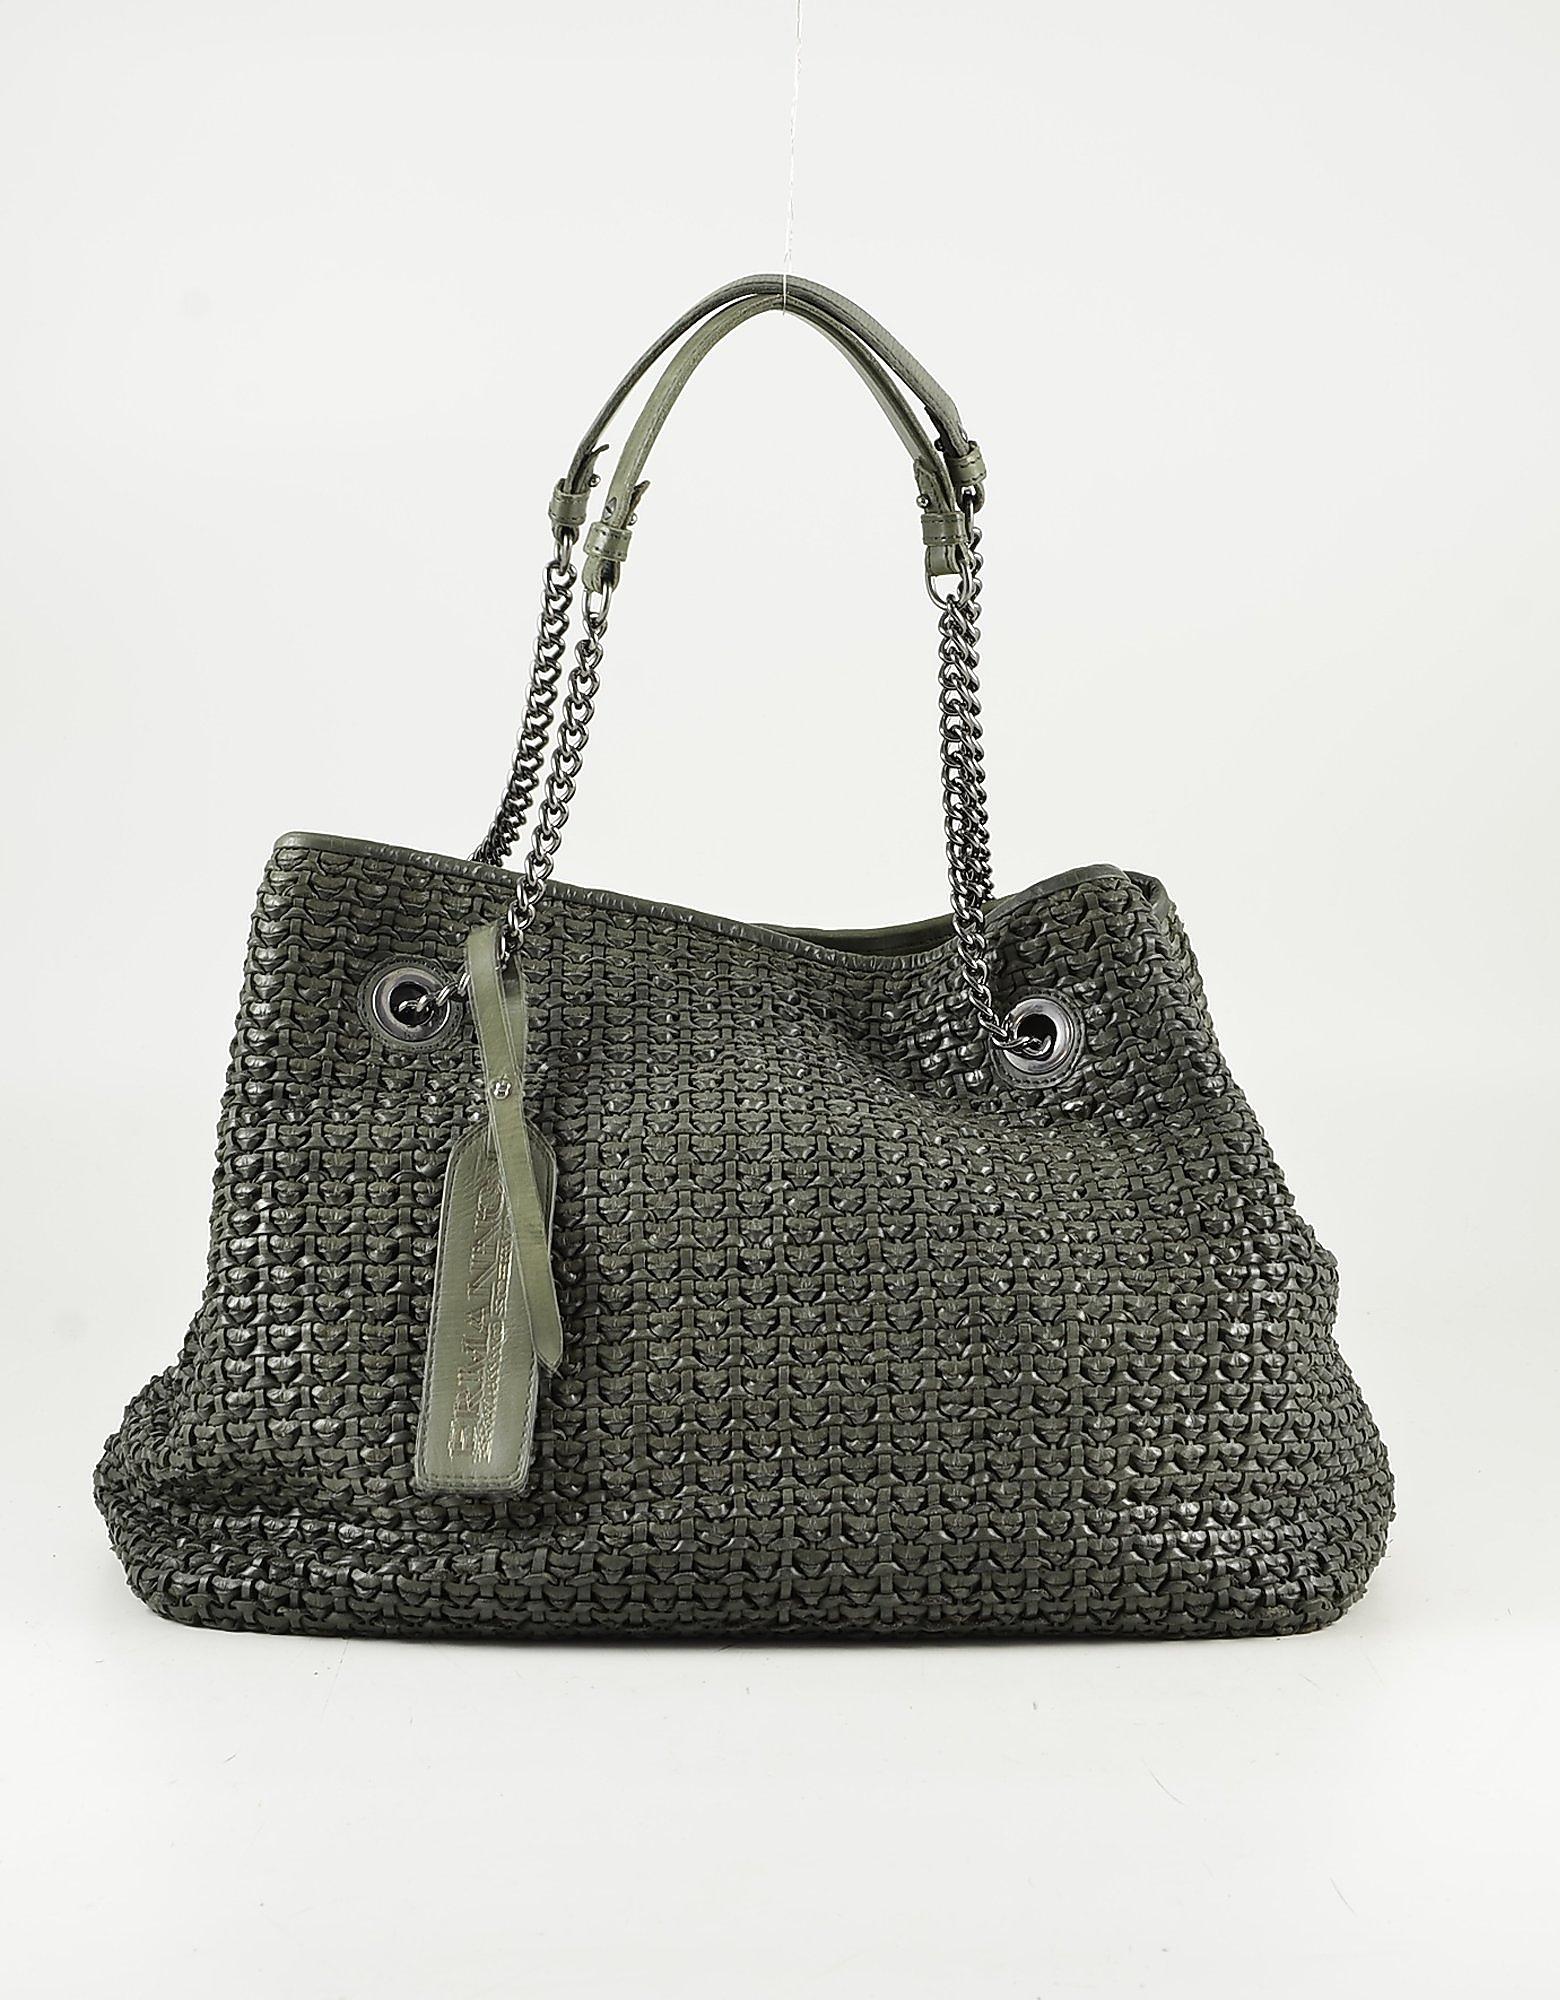 Ermanno Scervino Green Woven Leather Tote Bag